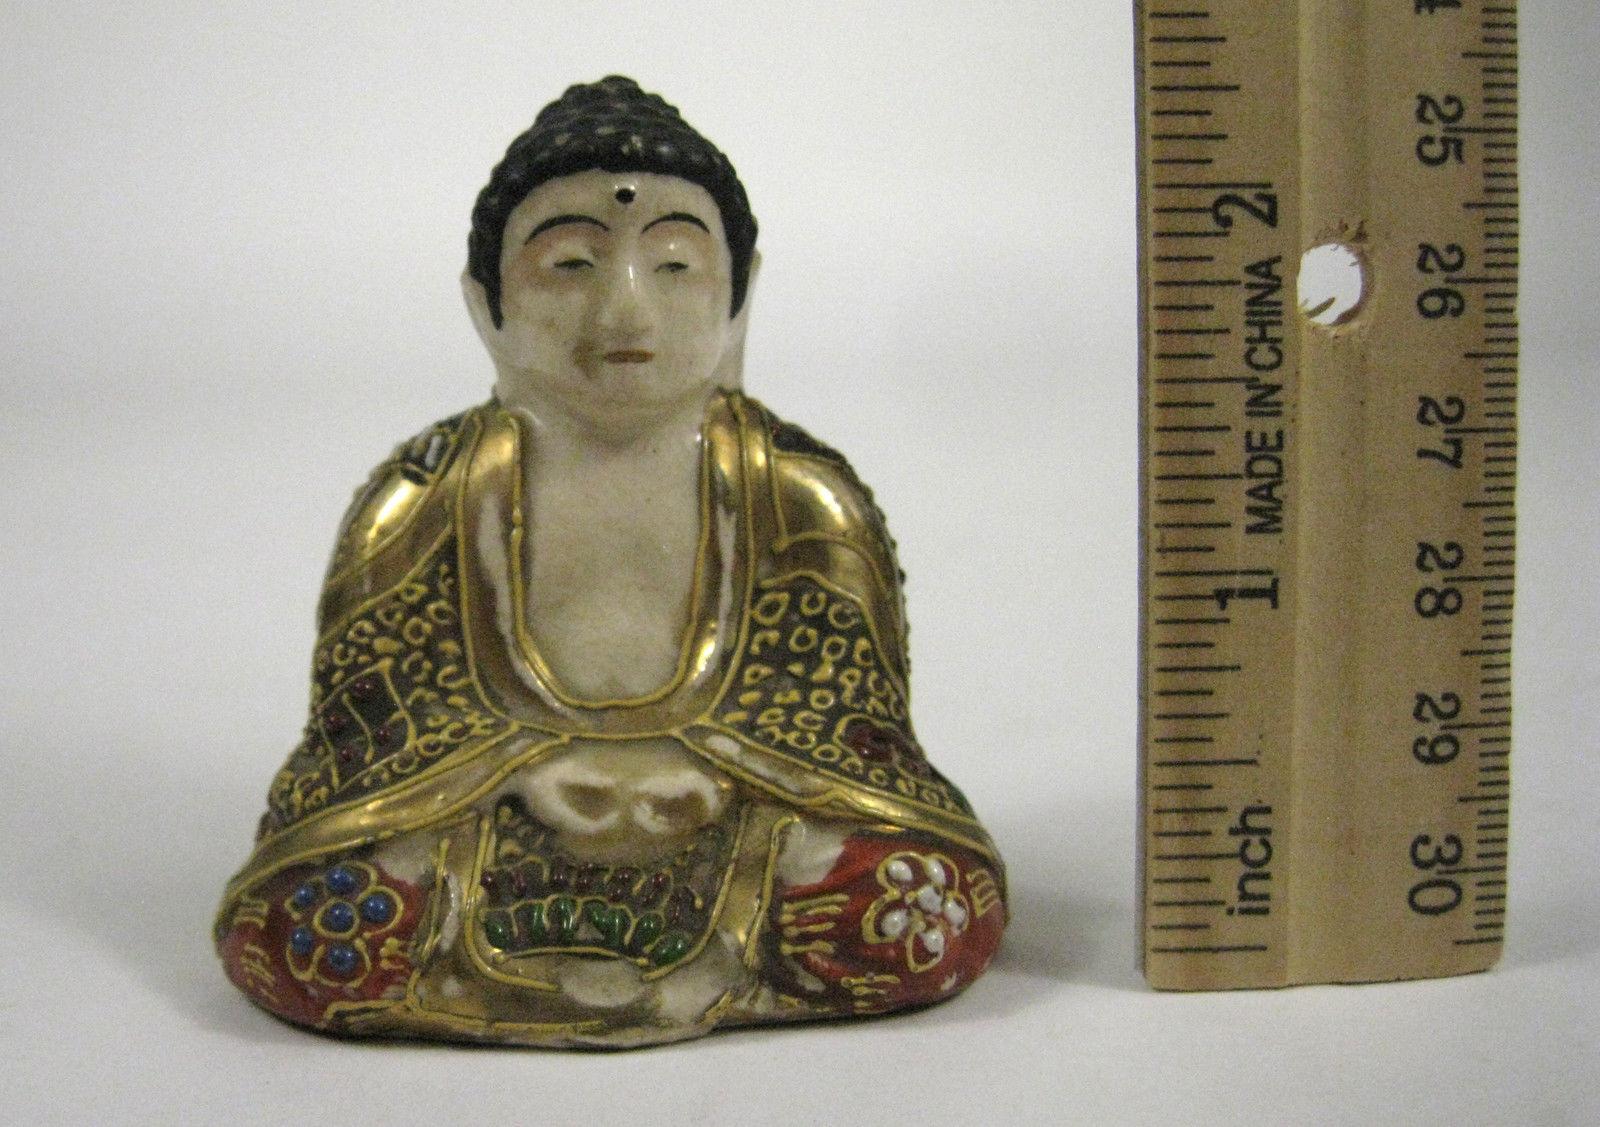 Buddha Ceramic Figurine Glazed Asian Goldtone Quinann Ouin Nan Seated 2.5 Inches